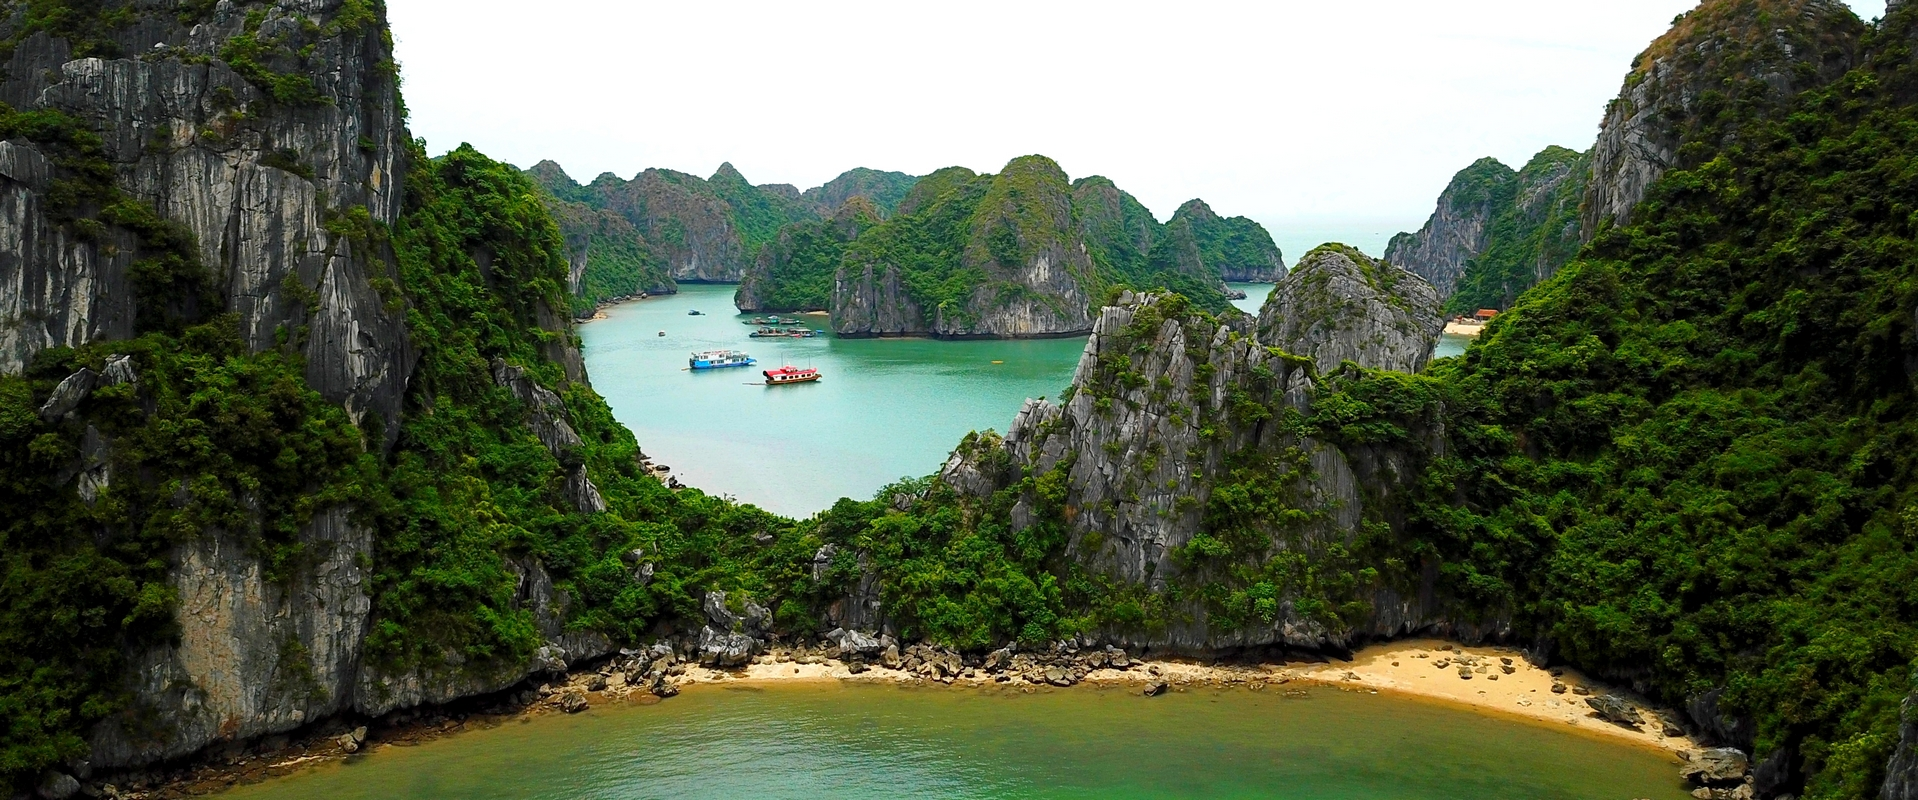 Gebetnout bijoux fantaisie lyon mode tendance bijouterie femme Oullins artisan baie halong vietnam tour du monde